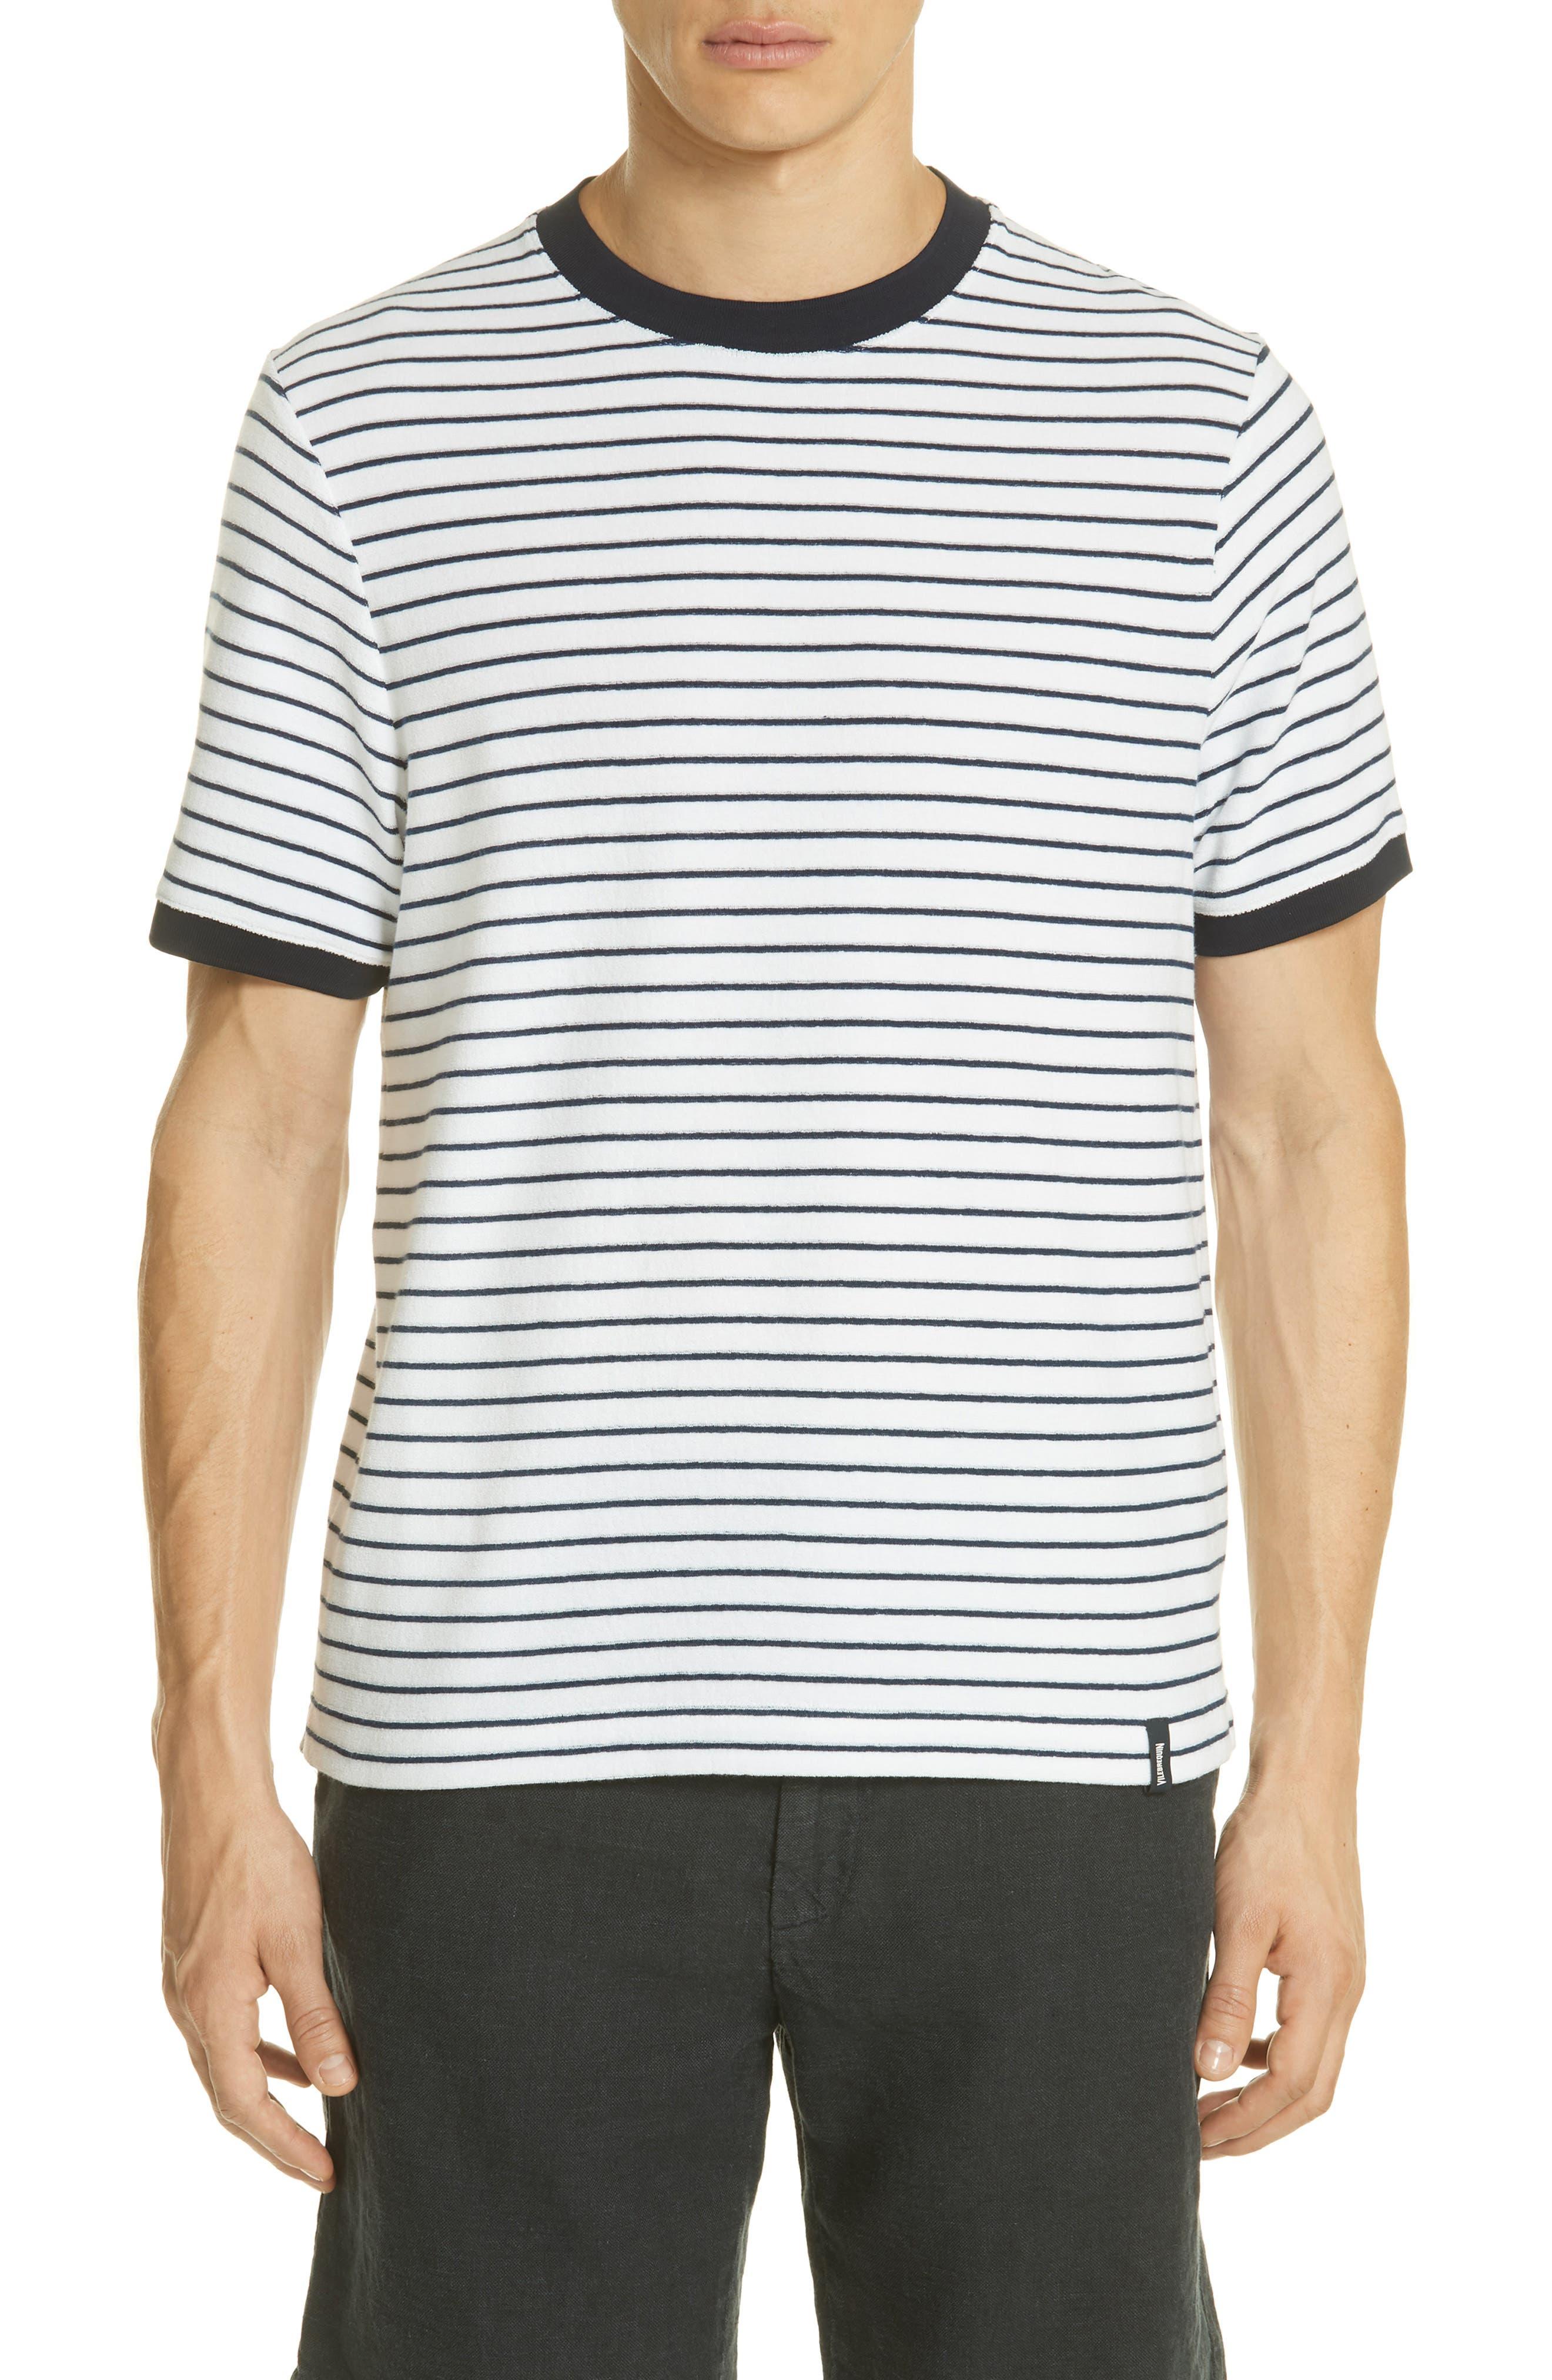 VILEBREQUIN, Stripe Terry T-Shirt, Main thumbnail 1, color, 402